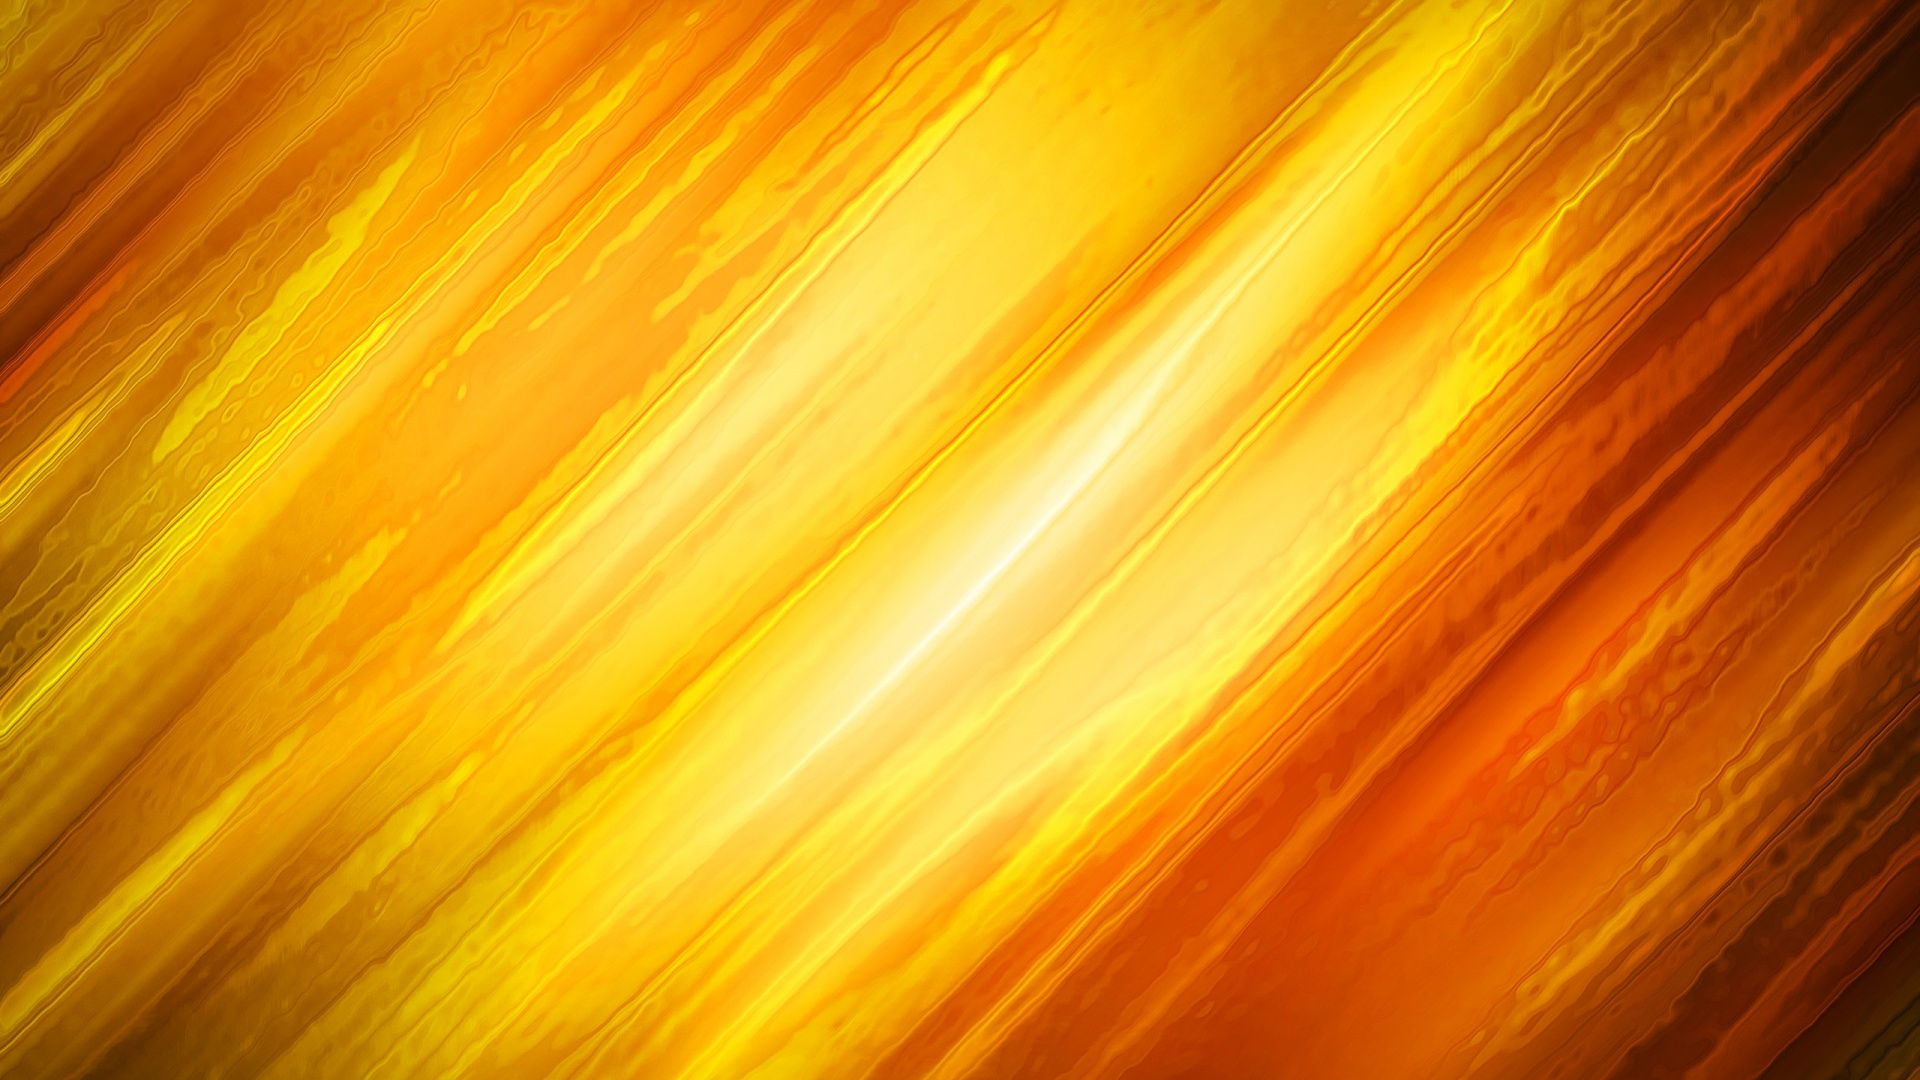 yellow abstract wallpaper hd - photo #29